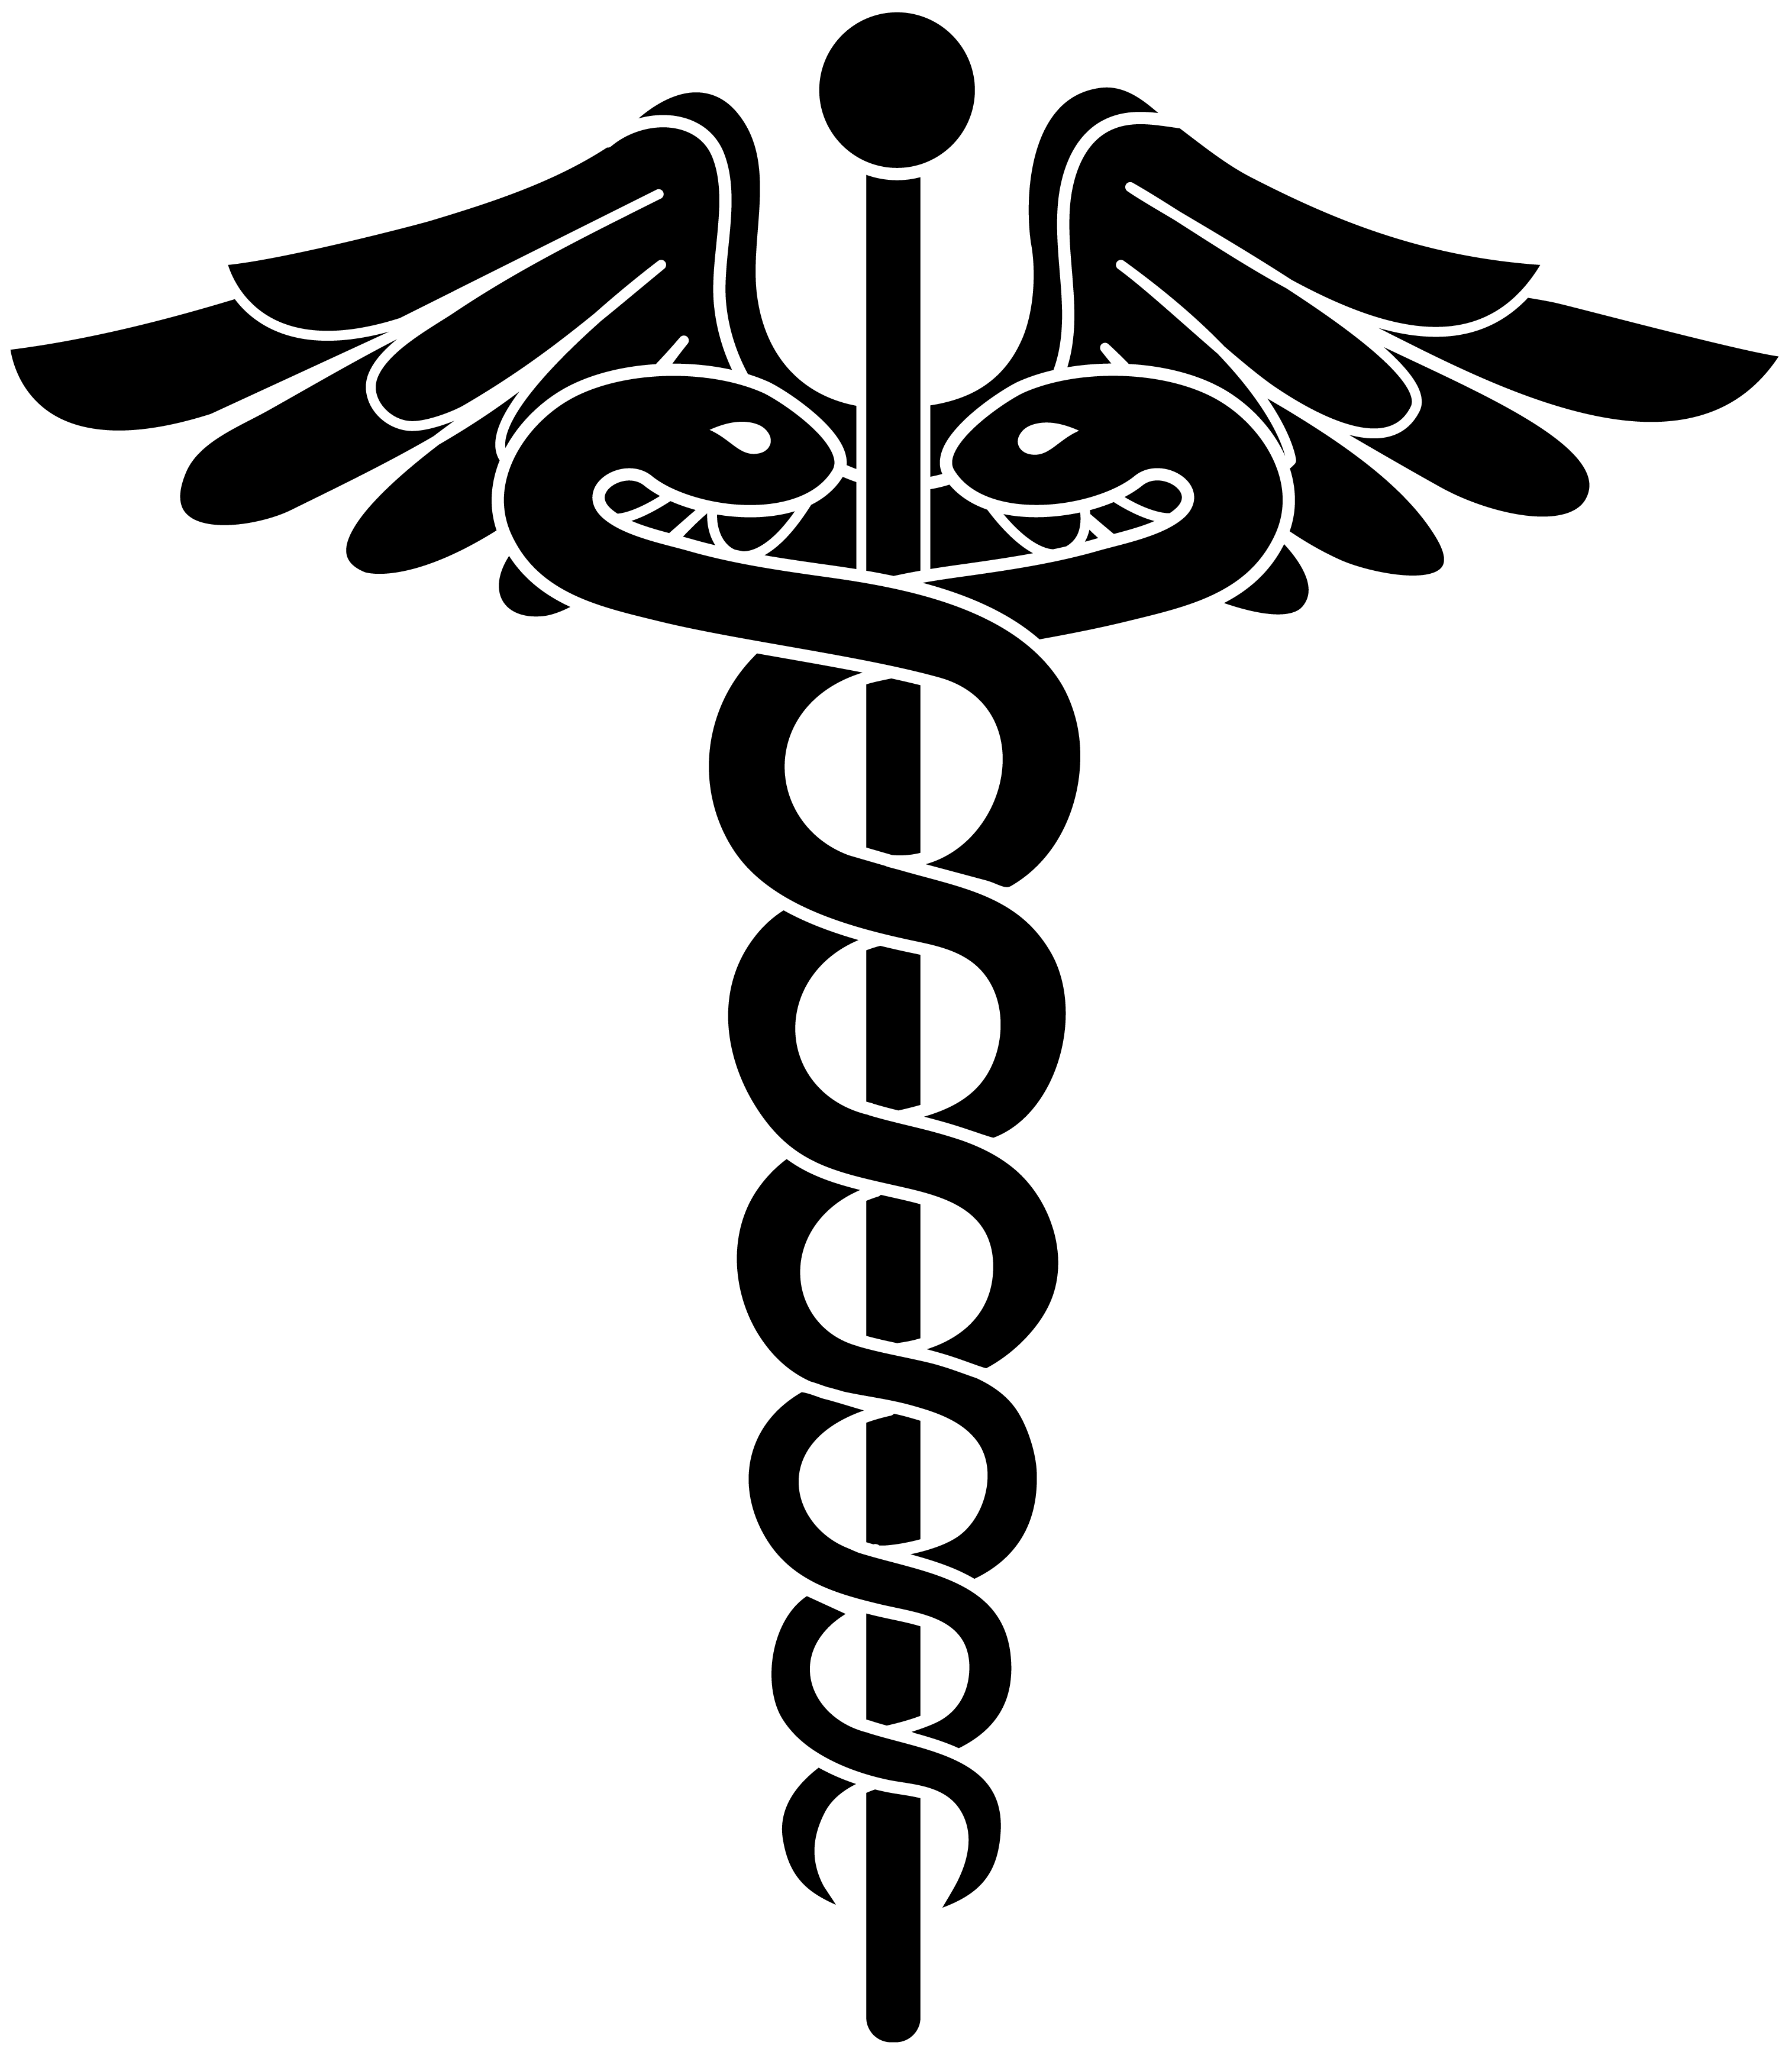 3029x3469 Doctor Symbol Png Transparent Doctor Symbol.png Images. Pluspng